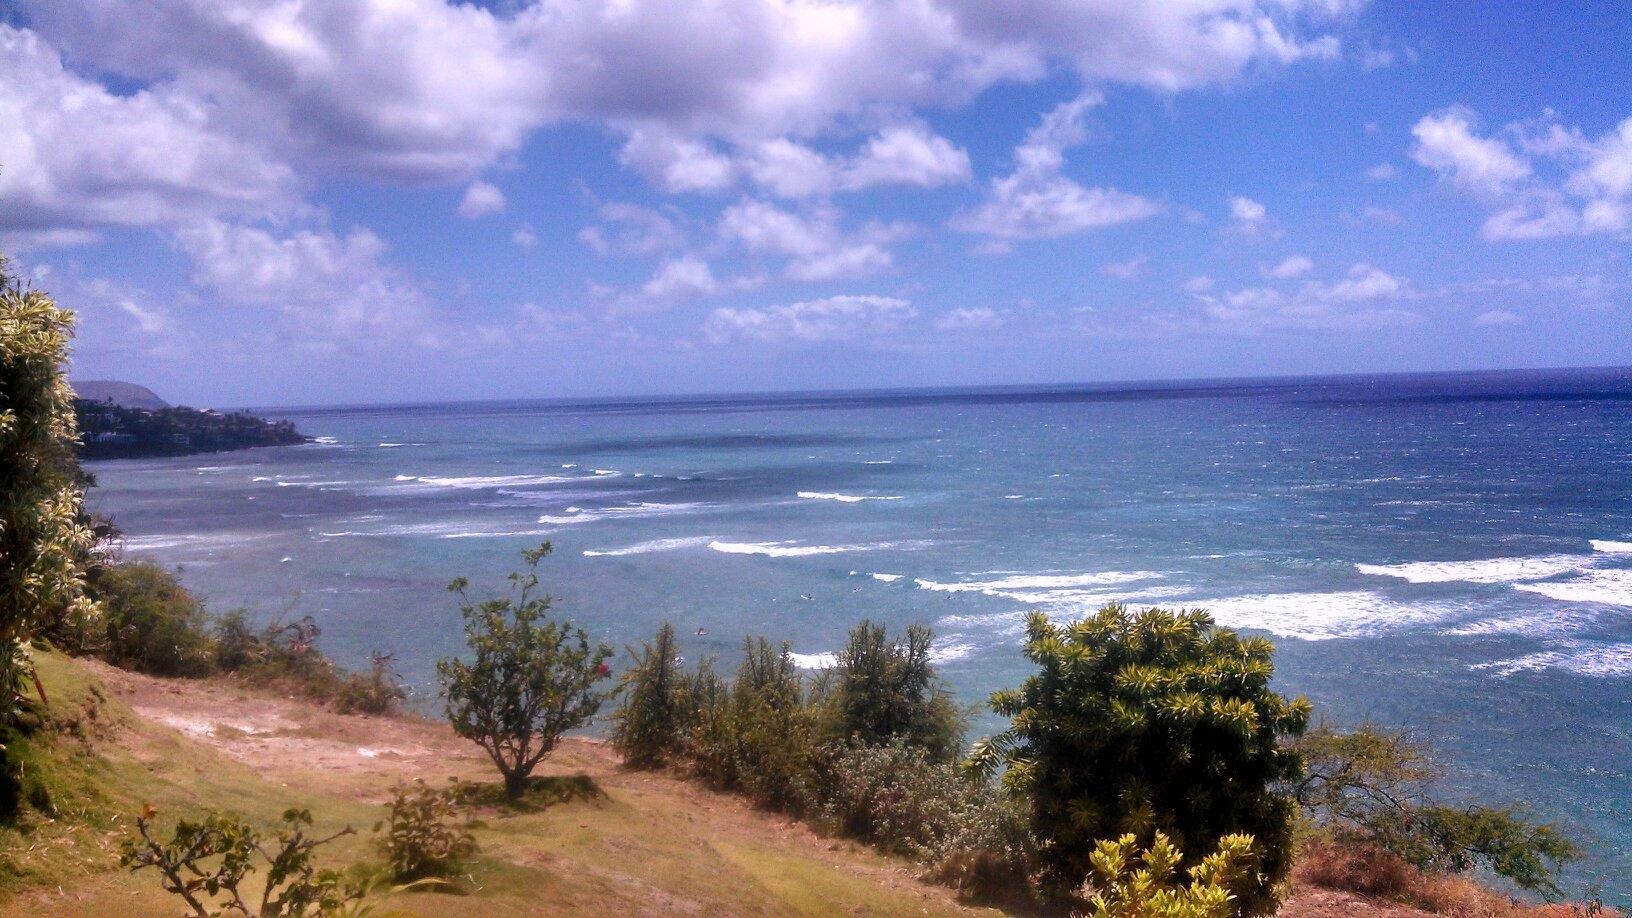 Oahu Condos In The Diamond Head Area